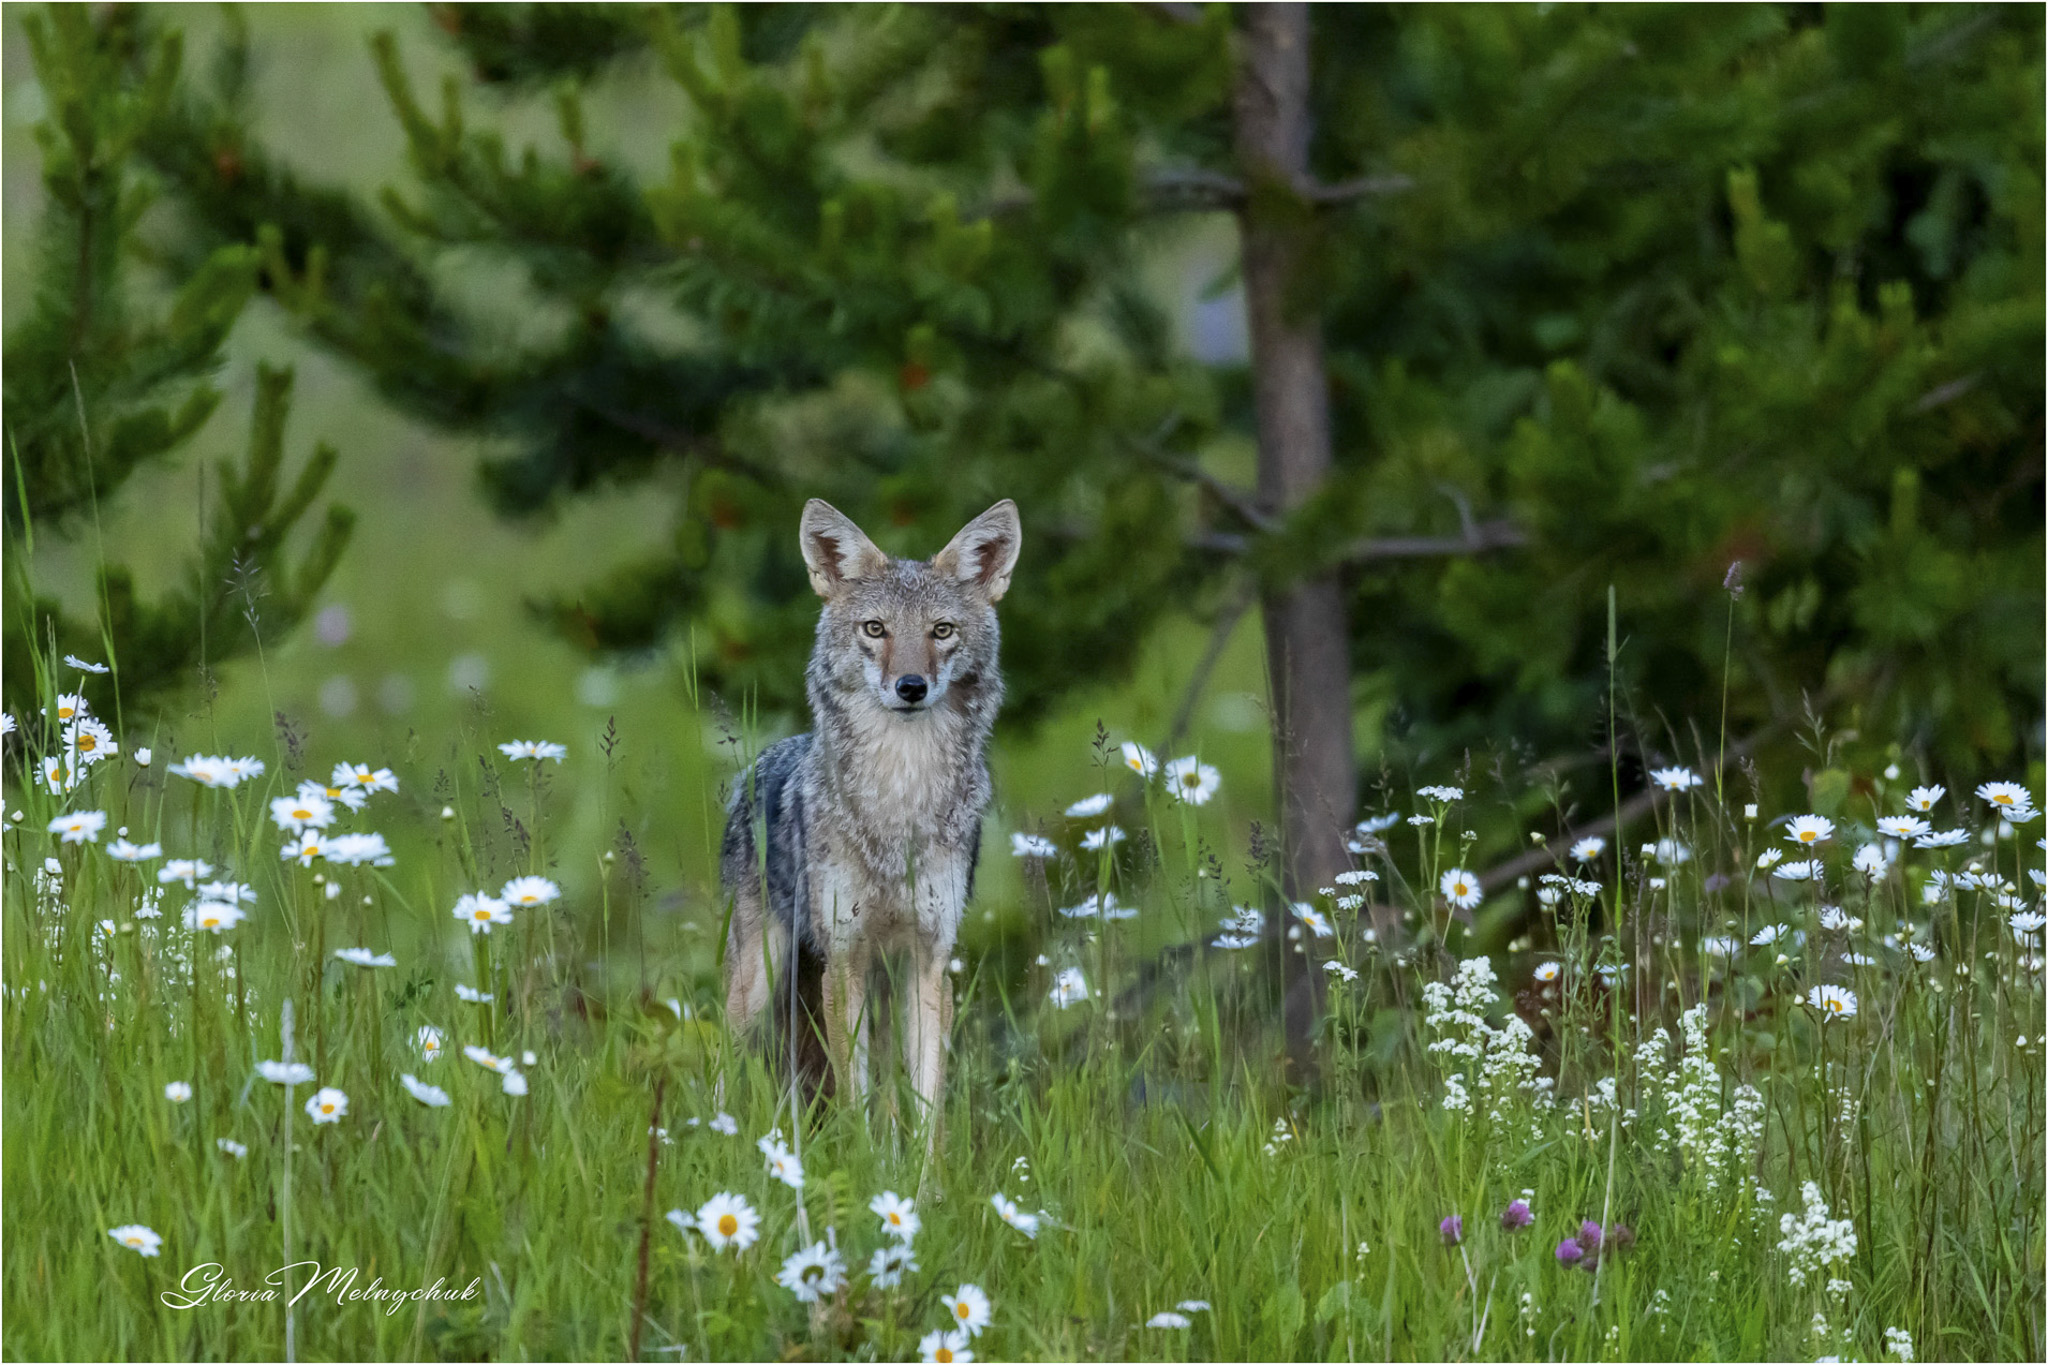 Coyote_GMP2418-34 - Gloria Melnychuk